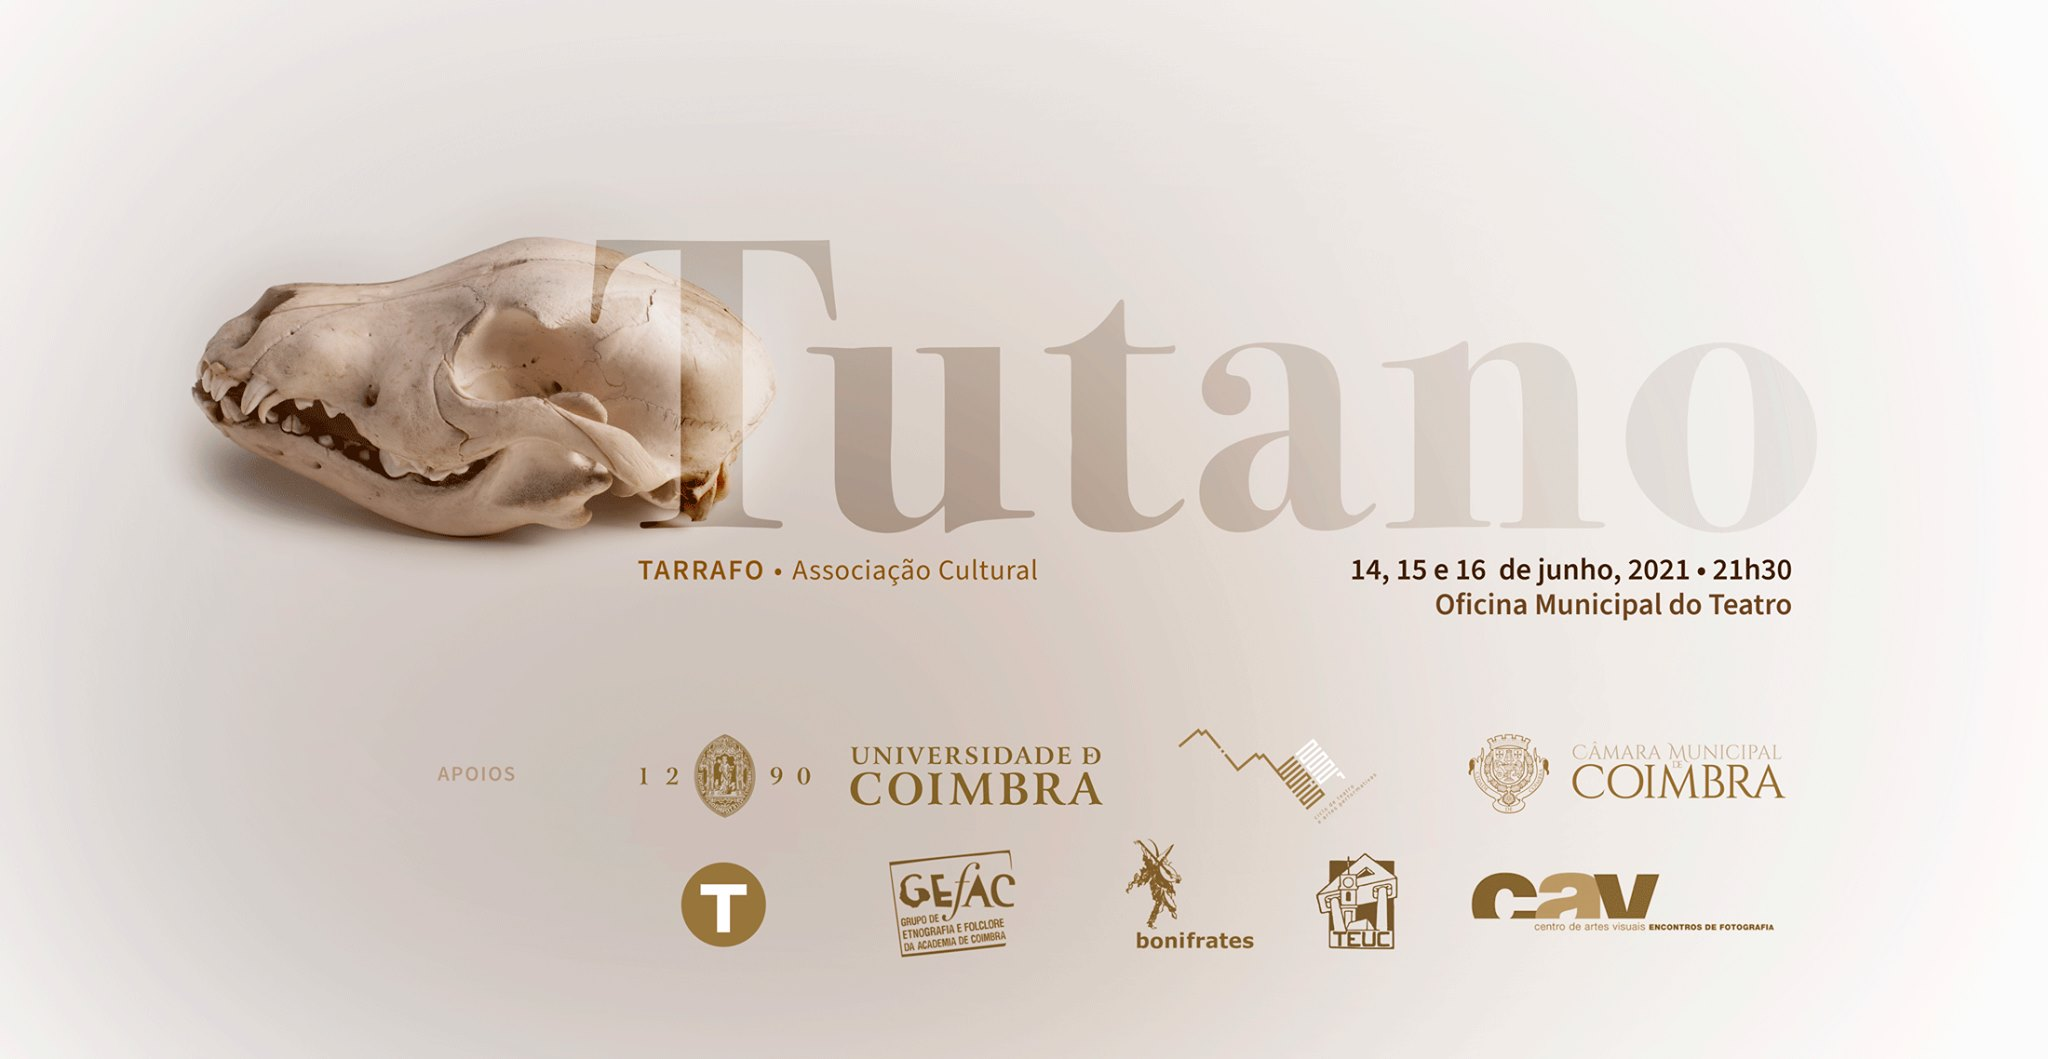 Tutano